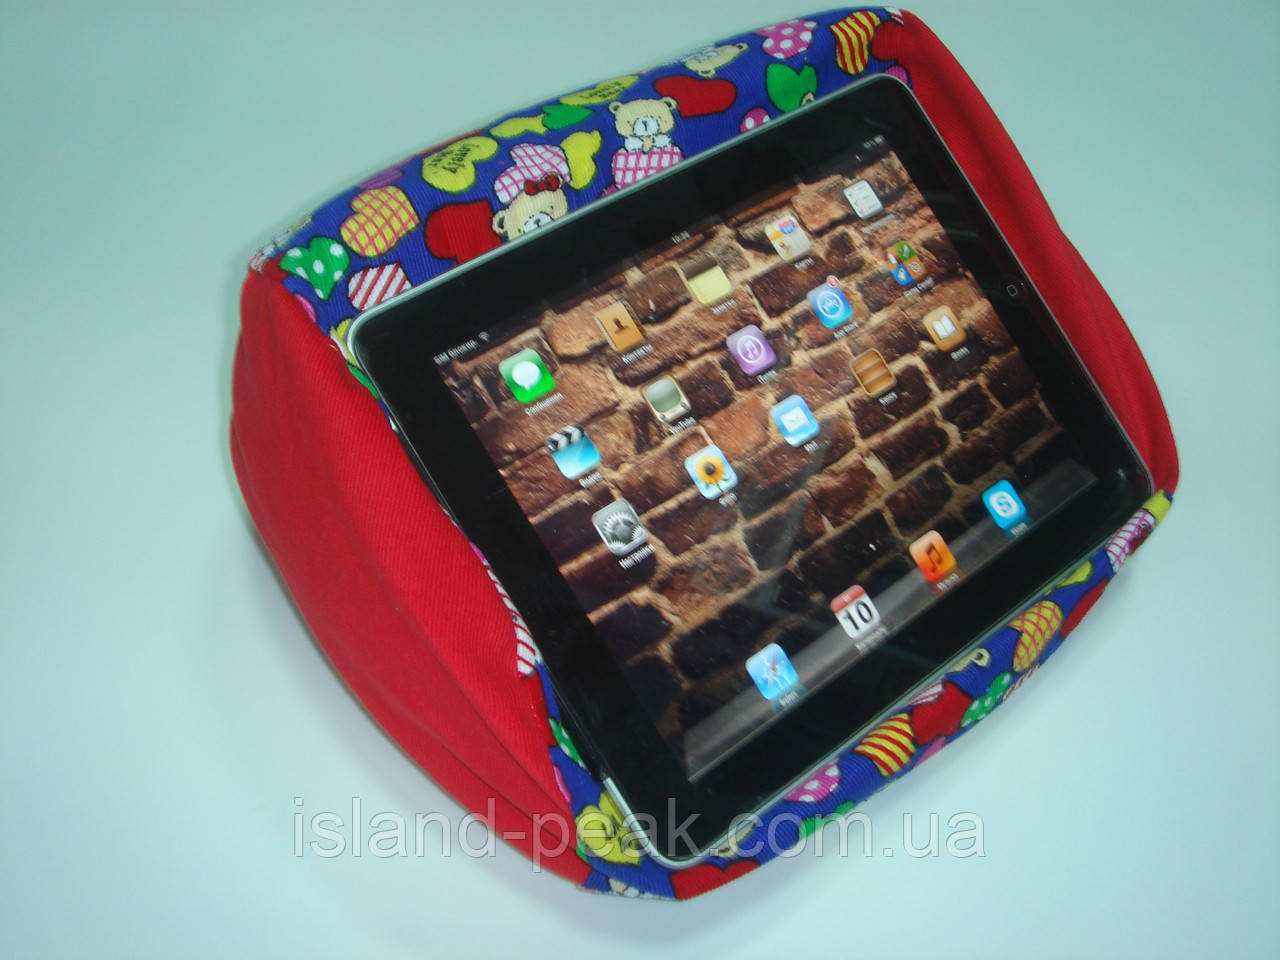 Подушка для планшета